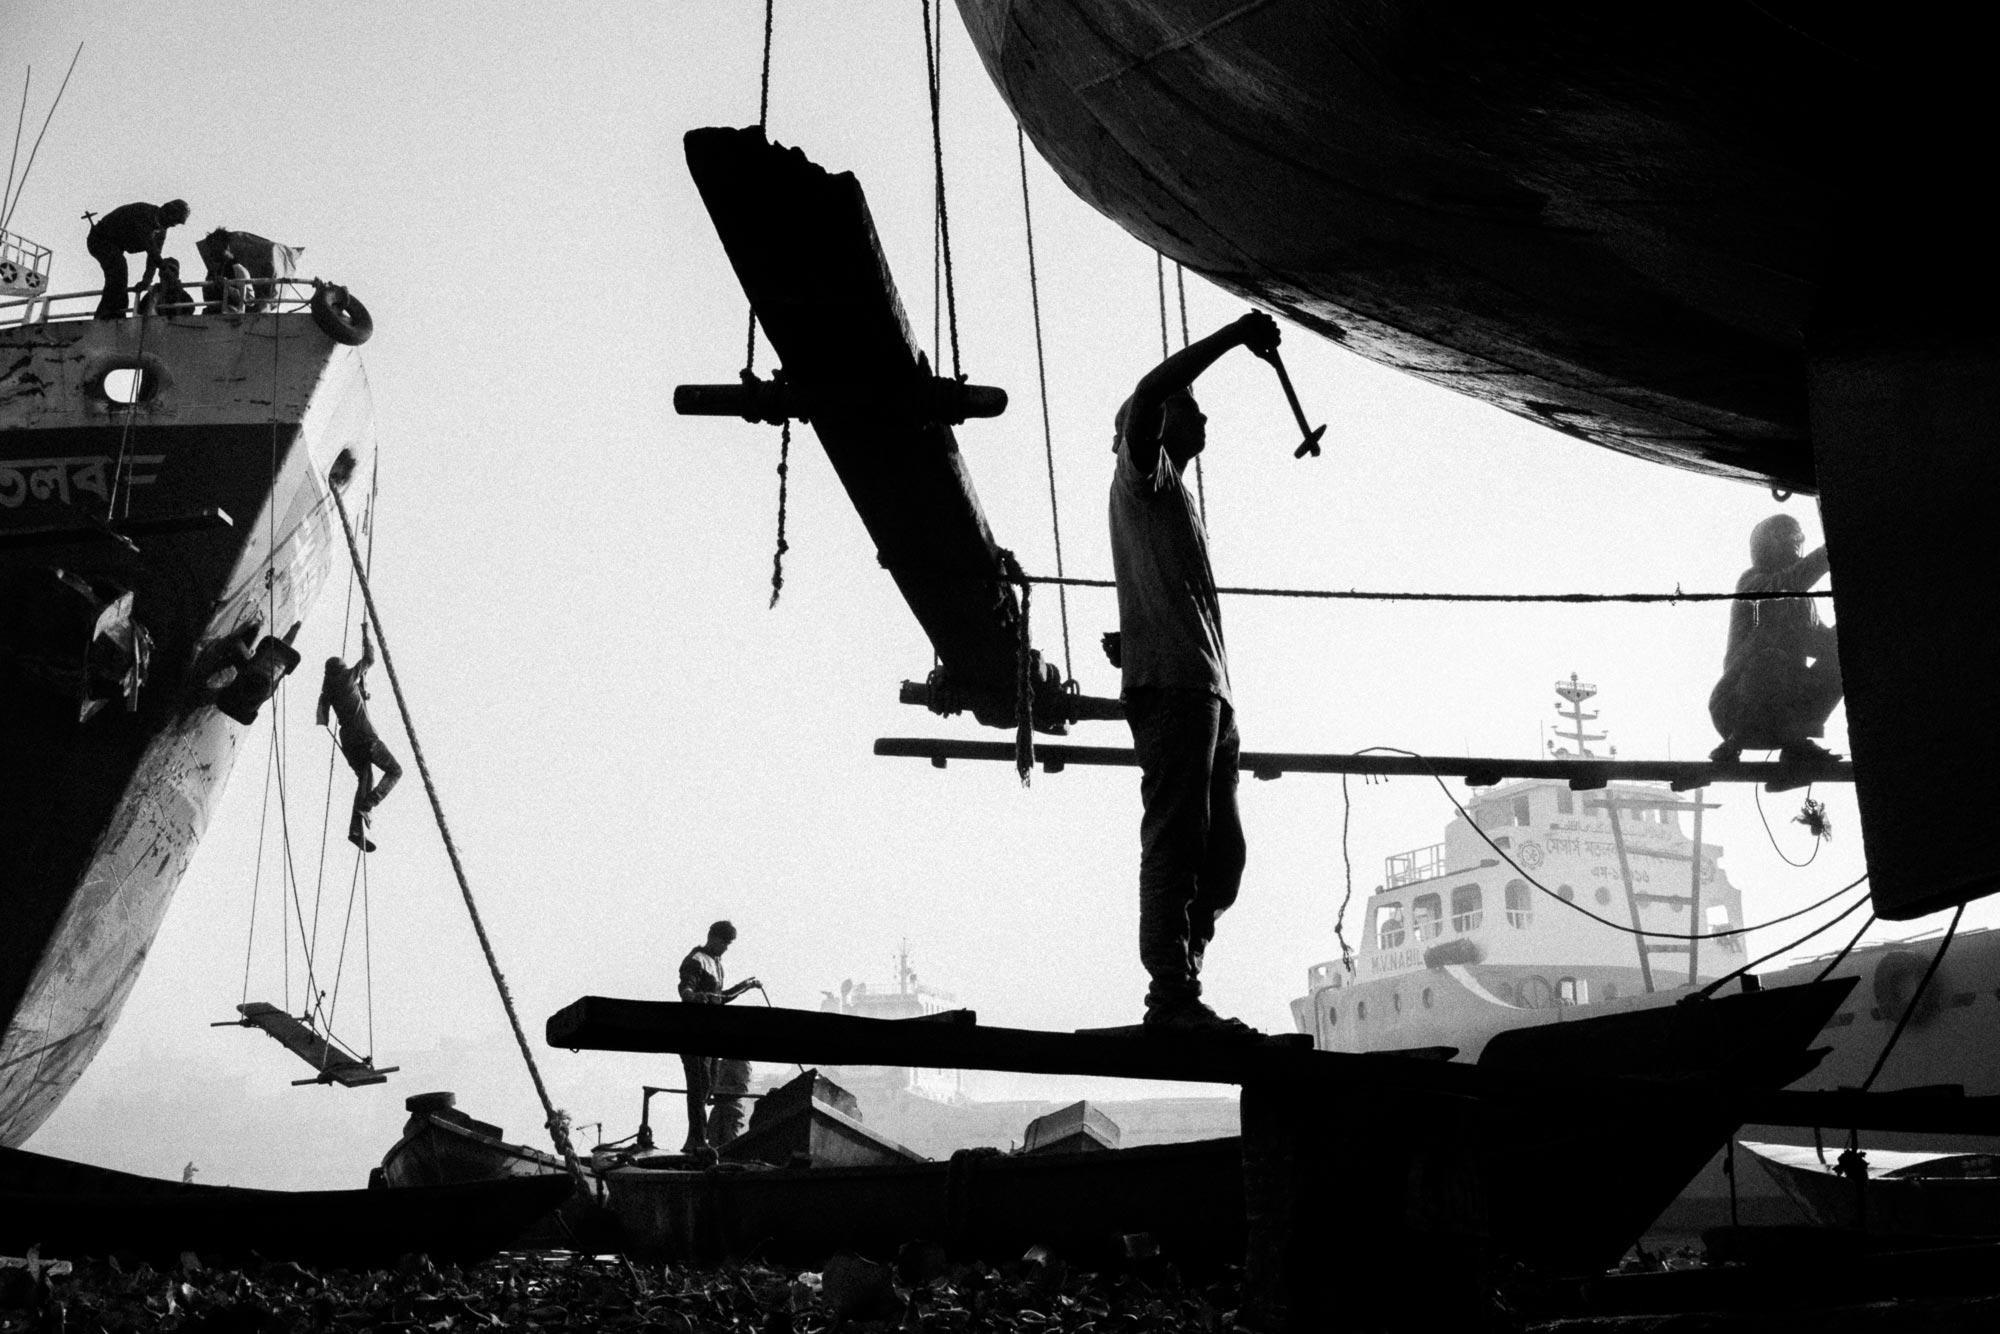 Fotografia documentaria Black and White in Bangladesh naufragio di navi di Graeme Heckels